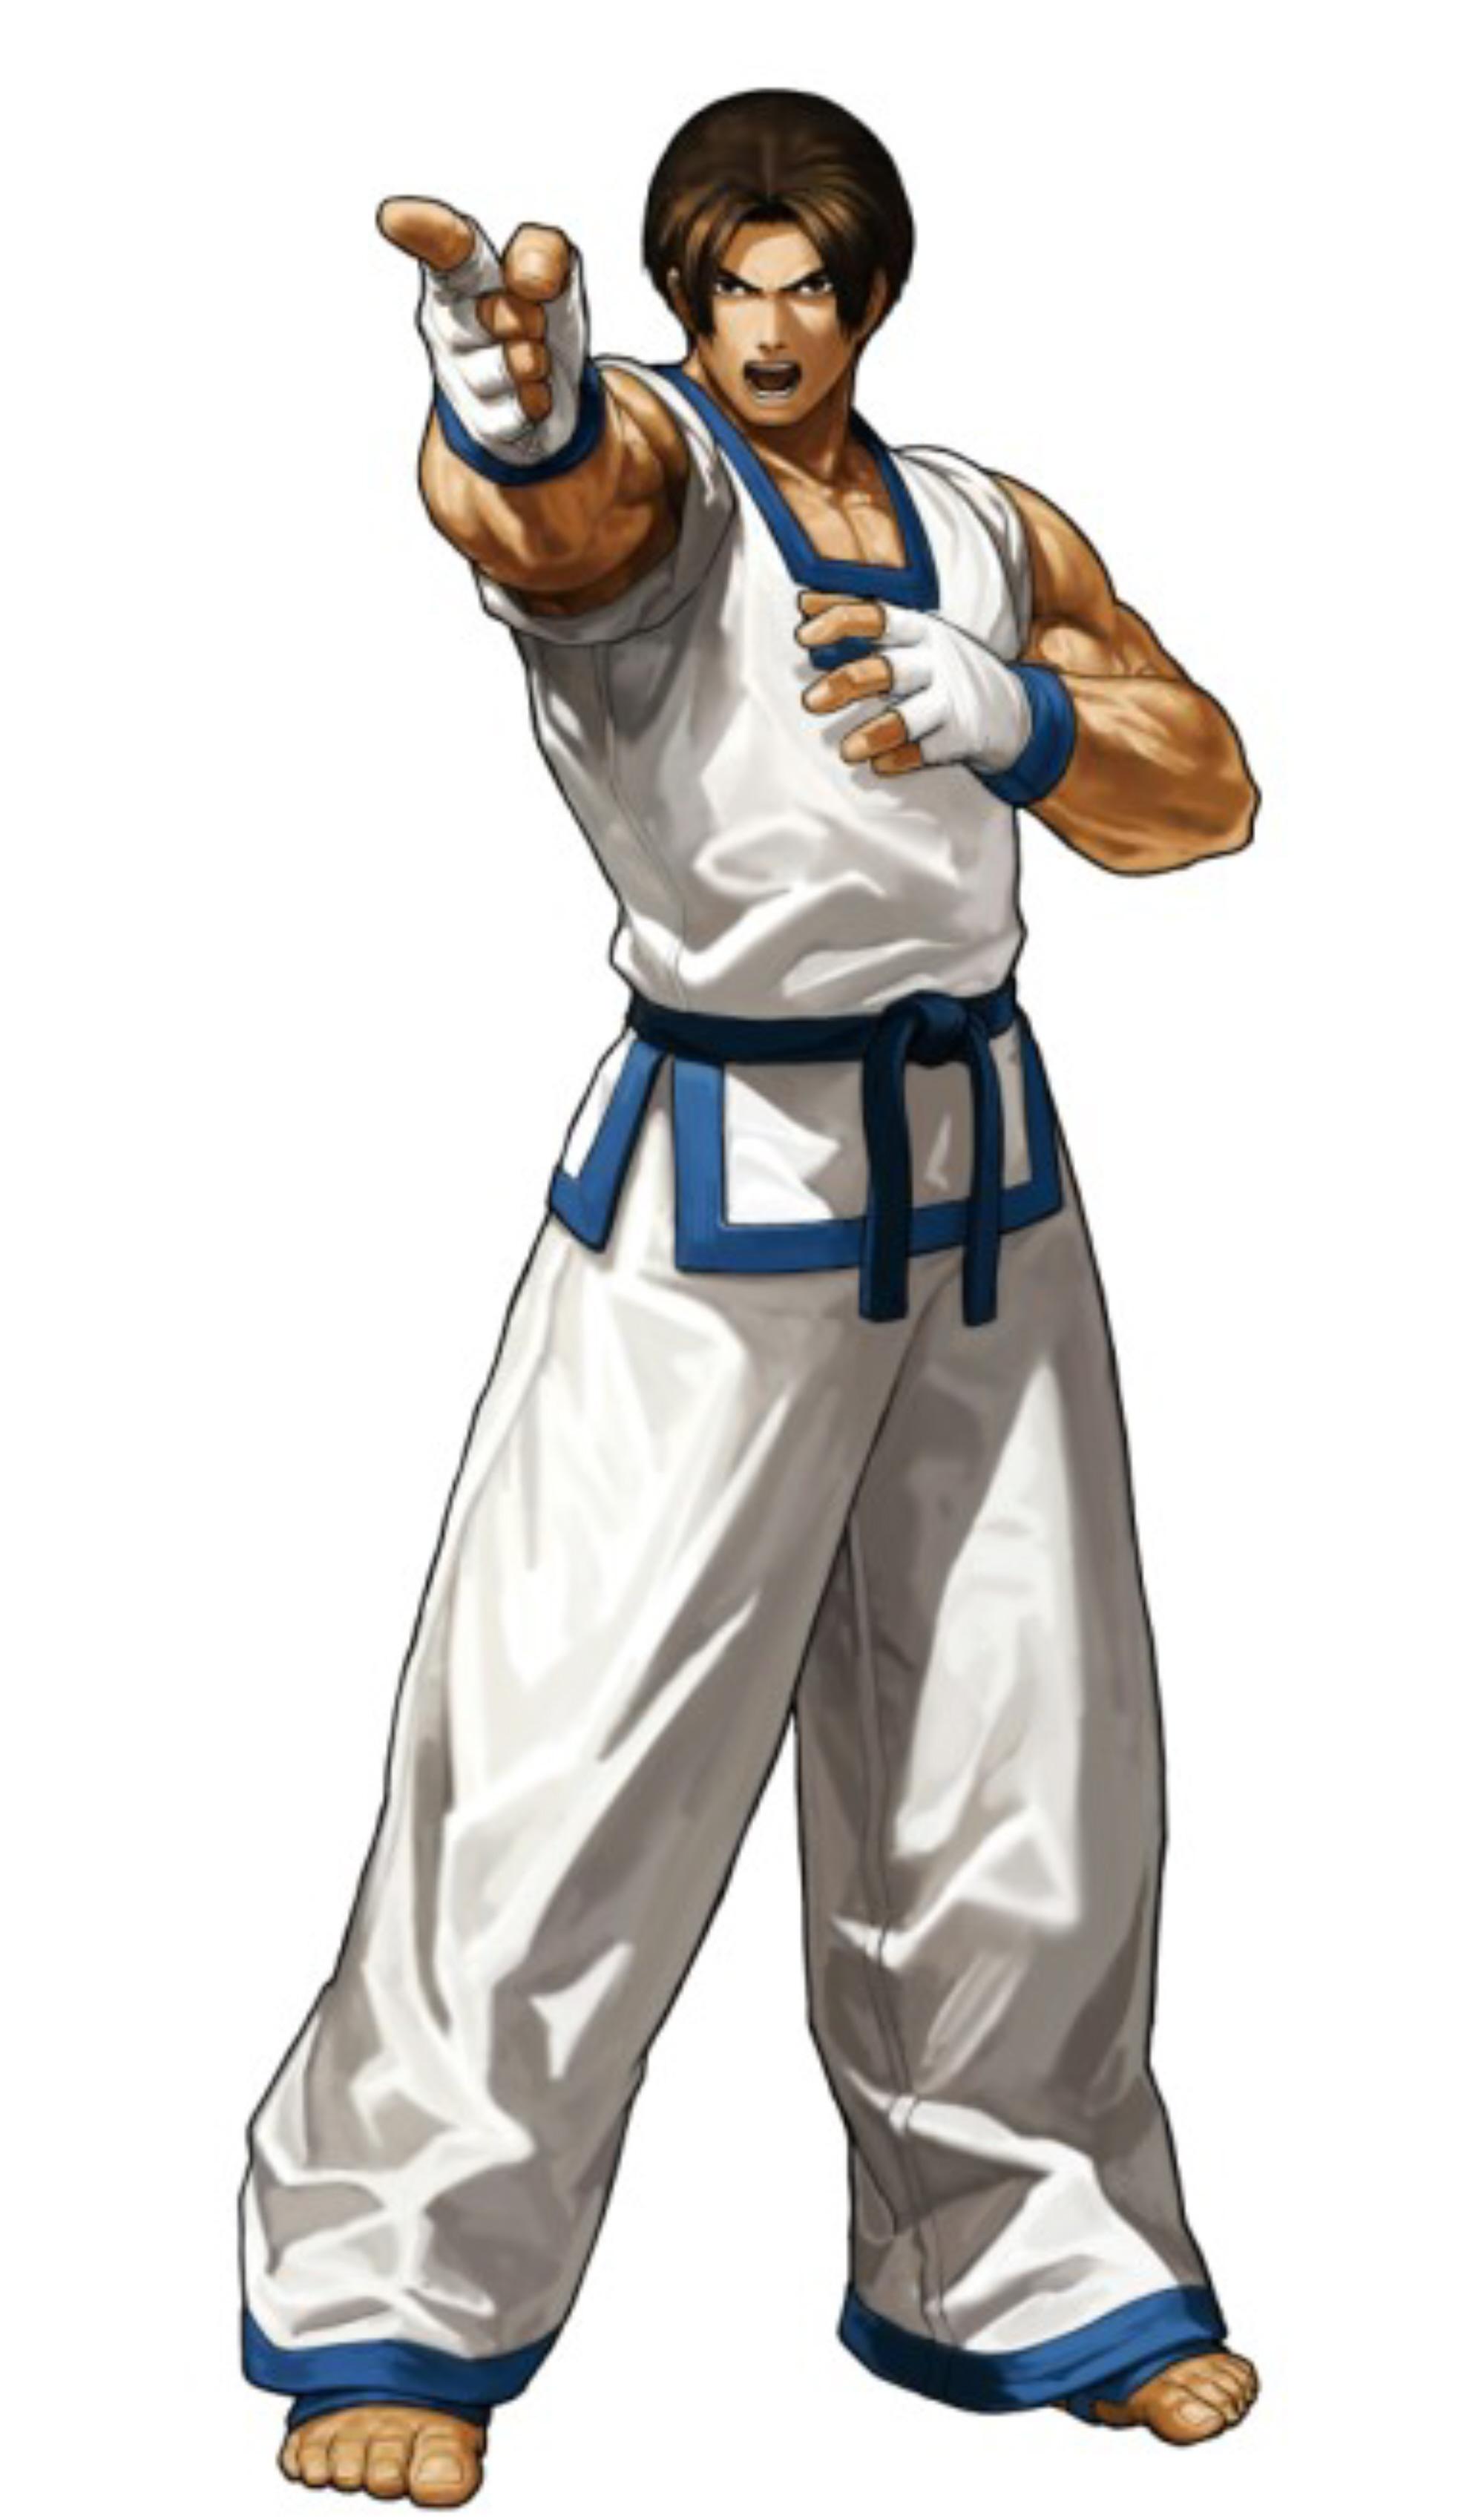 King of fighters xiii kim kaphwan character artwork - King of fighters characters pictures ...